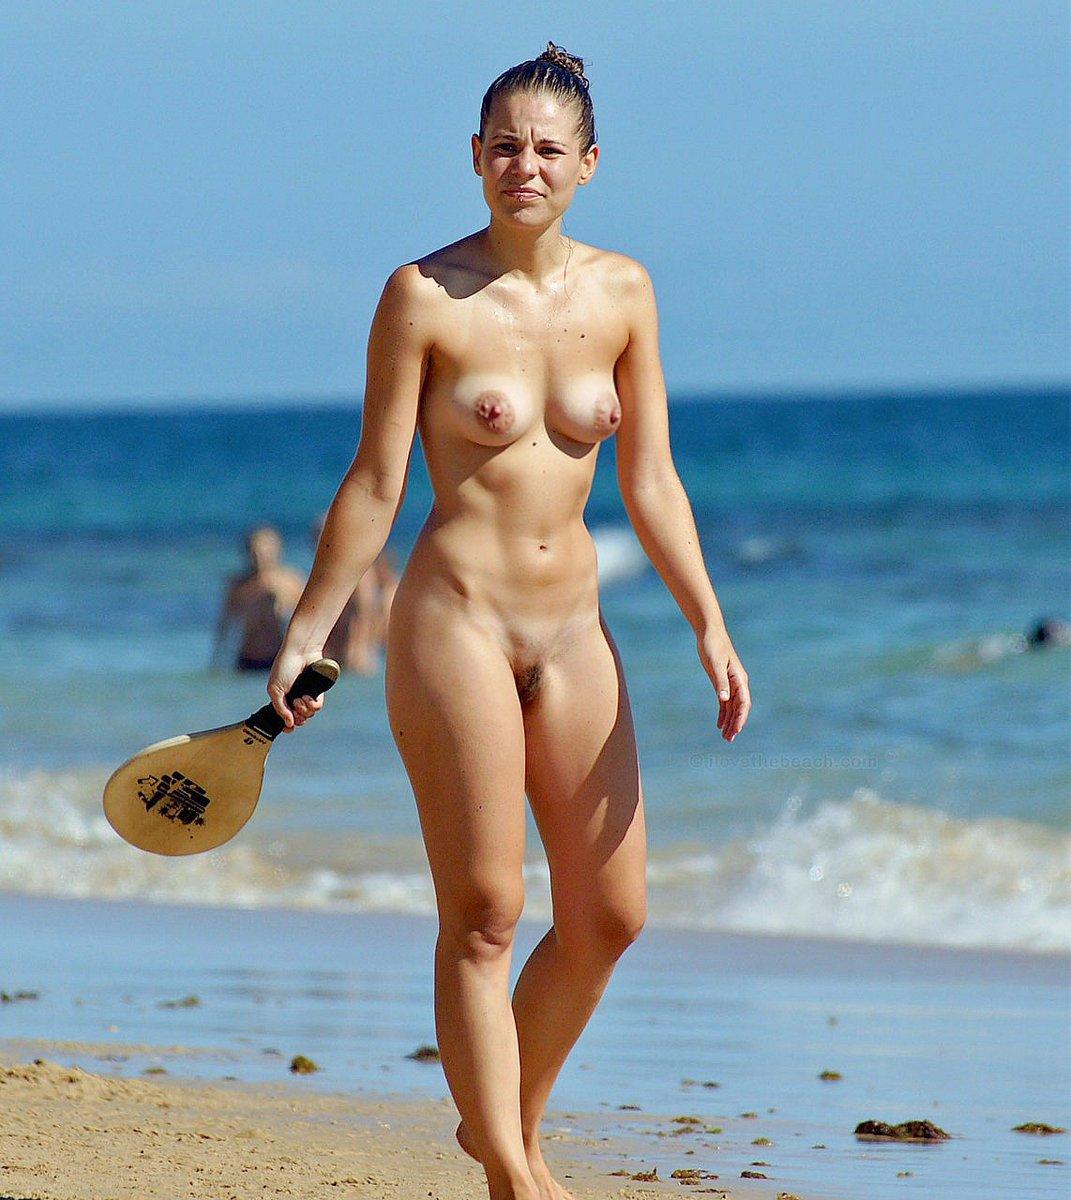 Keeley hazell nude fakes